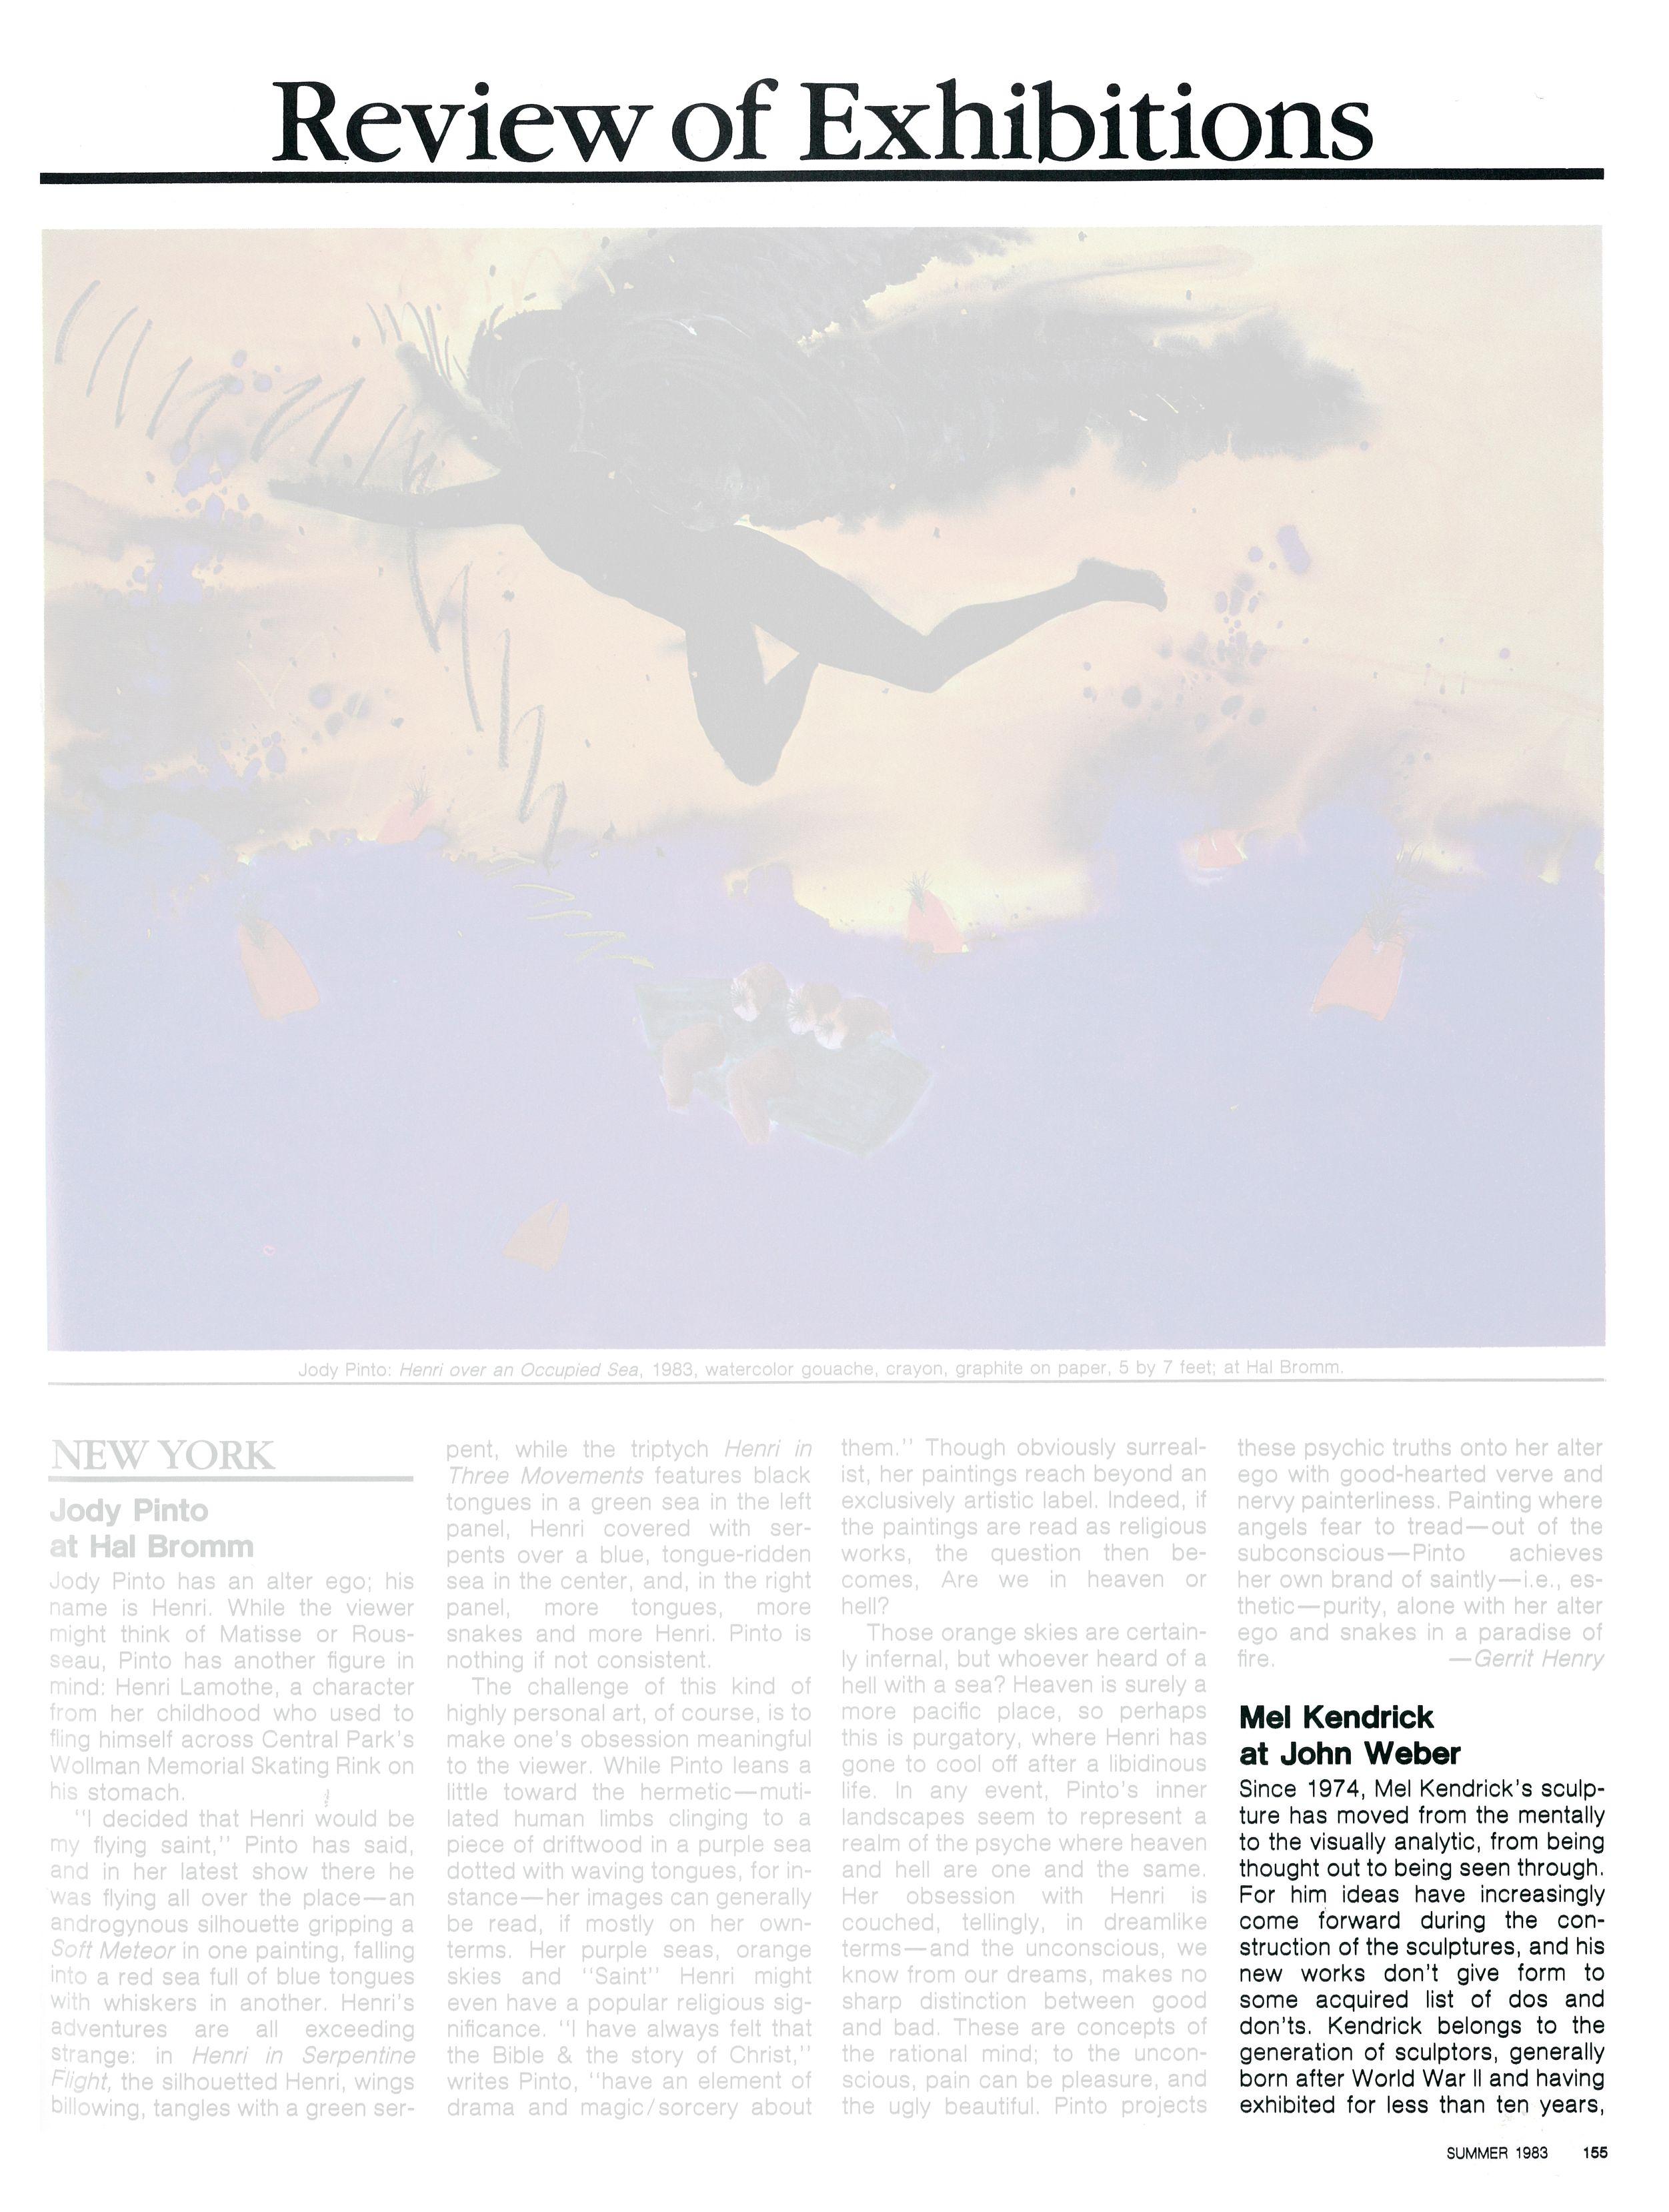 art_in_america_1983_mel_kendrick_page155